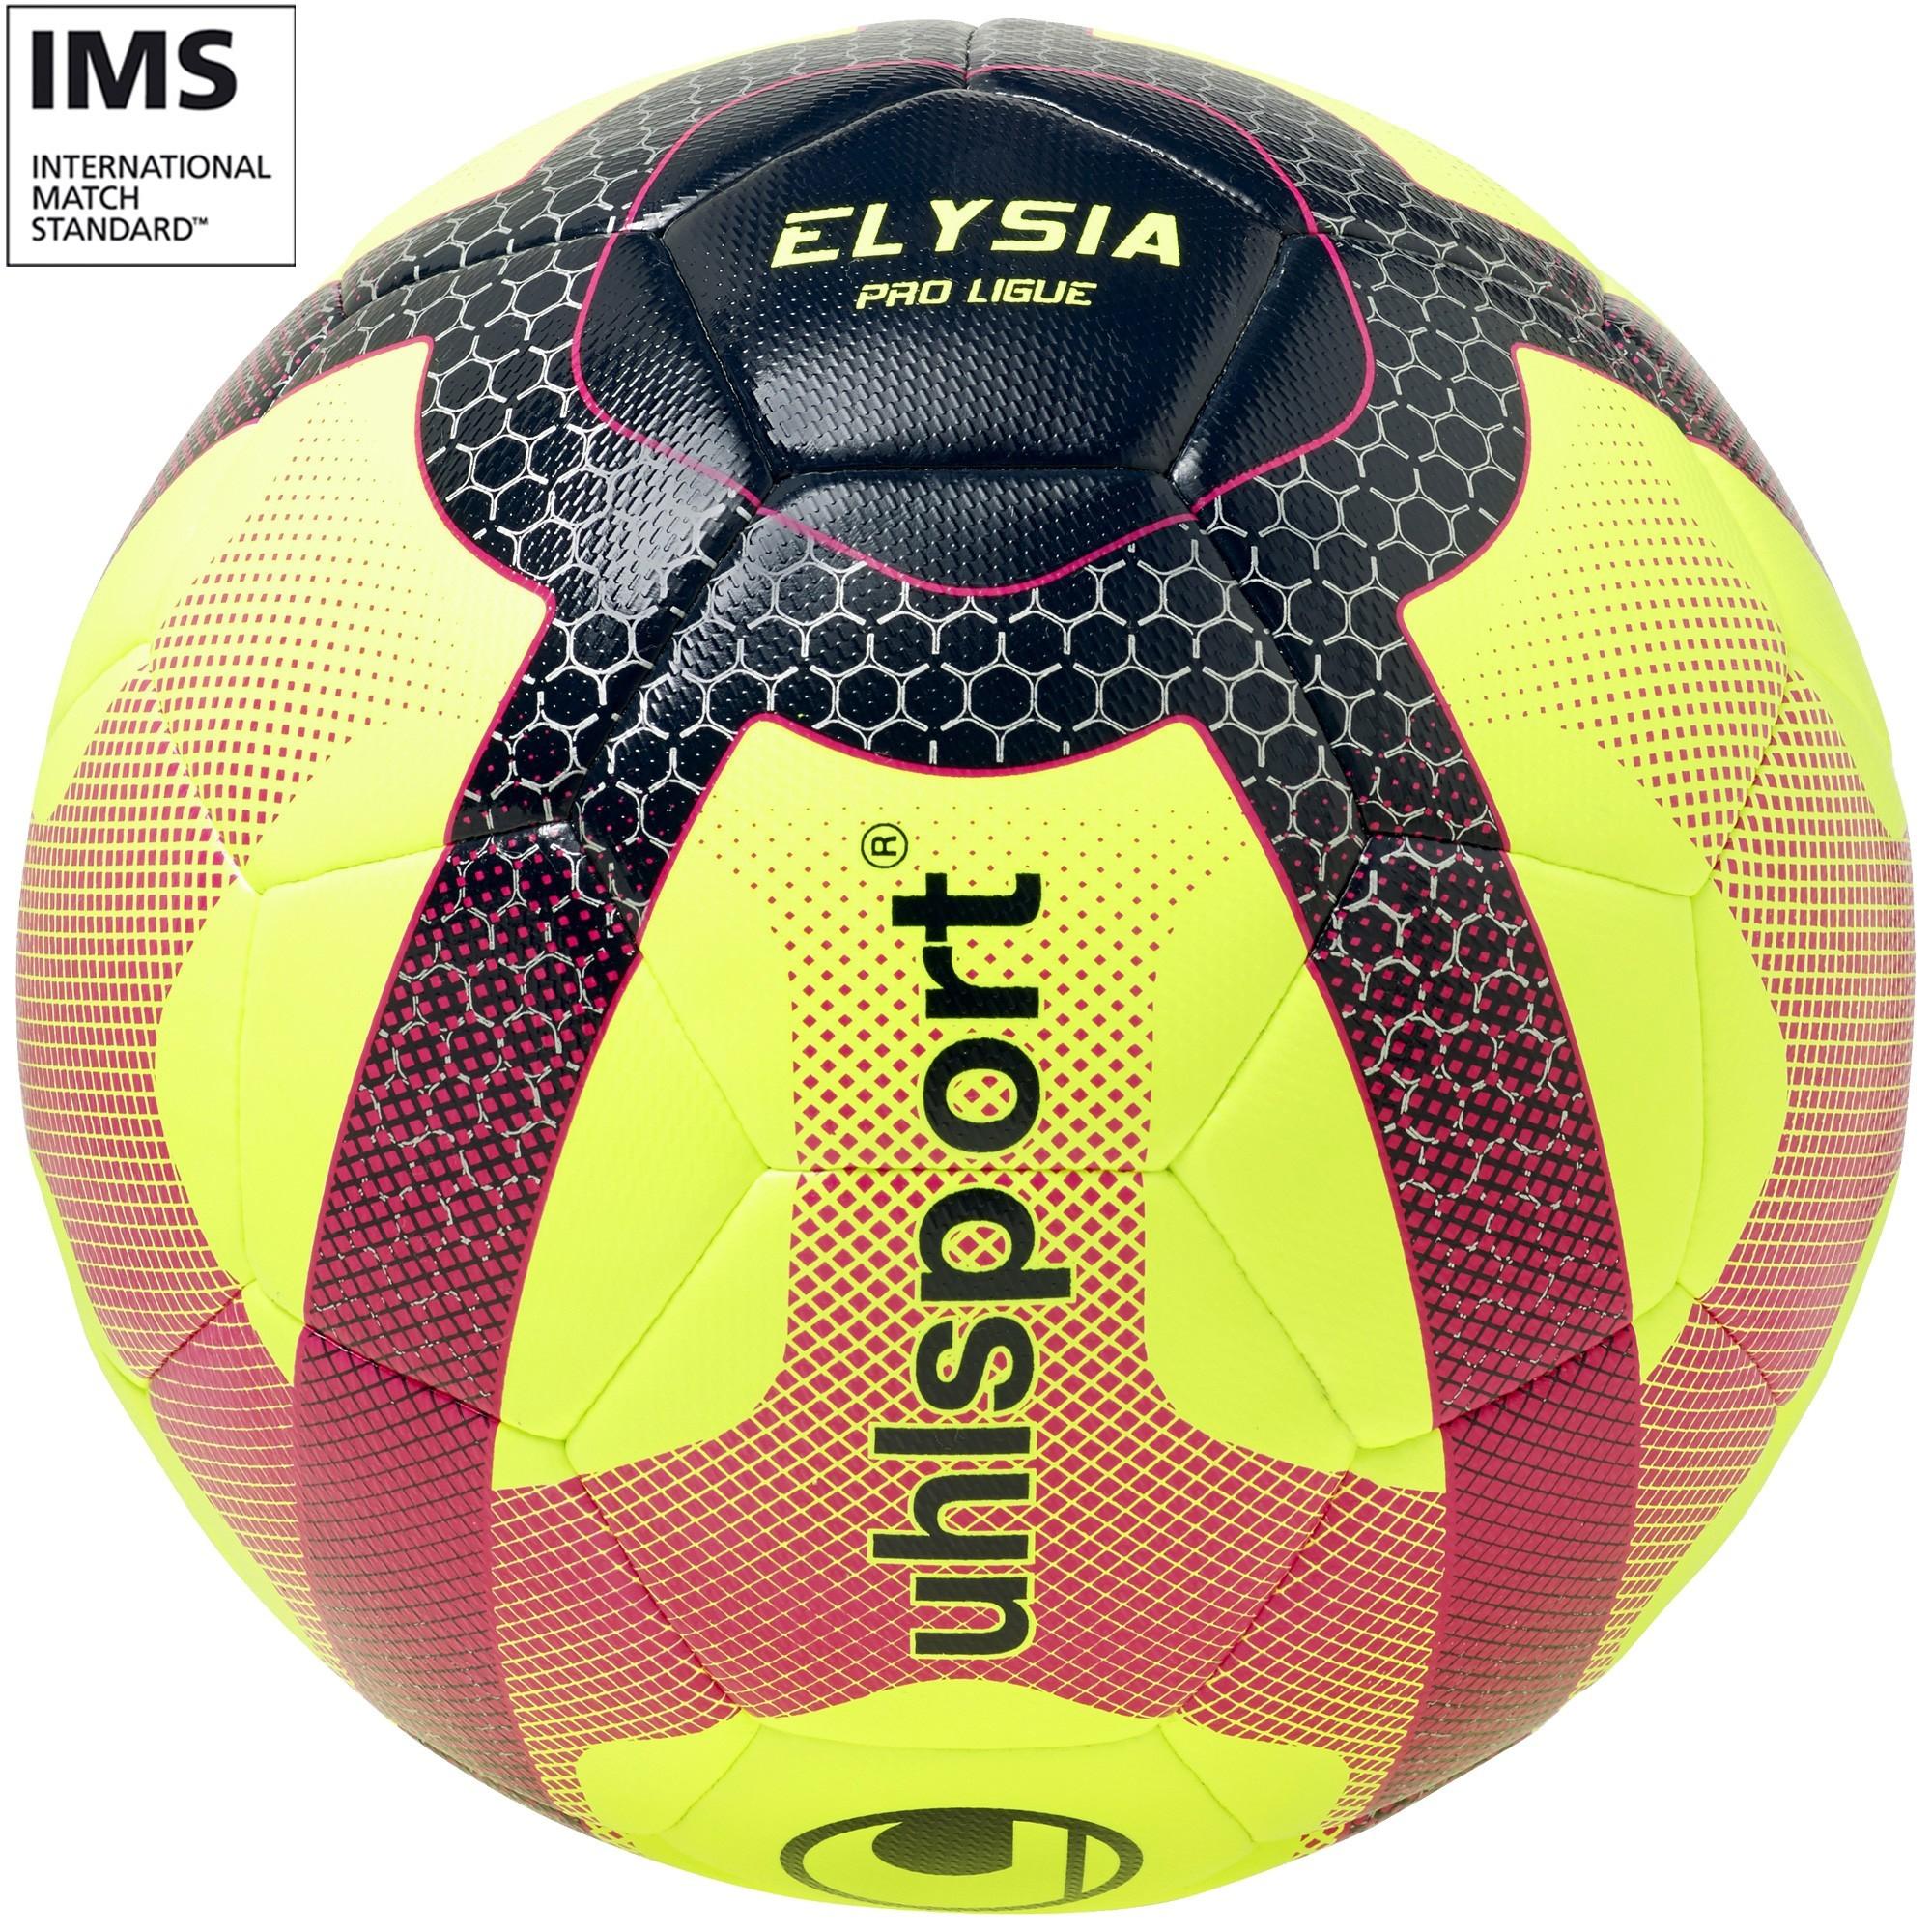 Ballon Pro Ligue Elysia